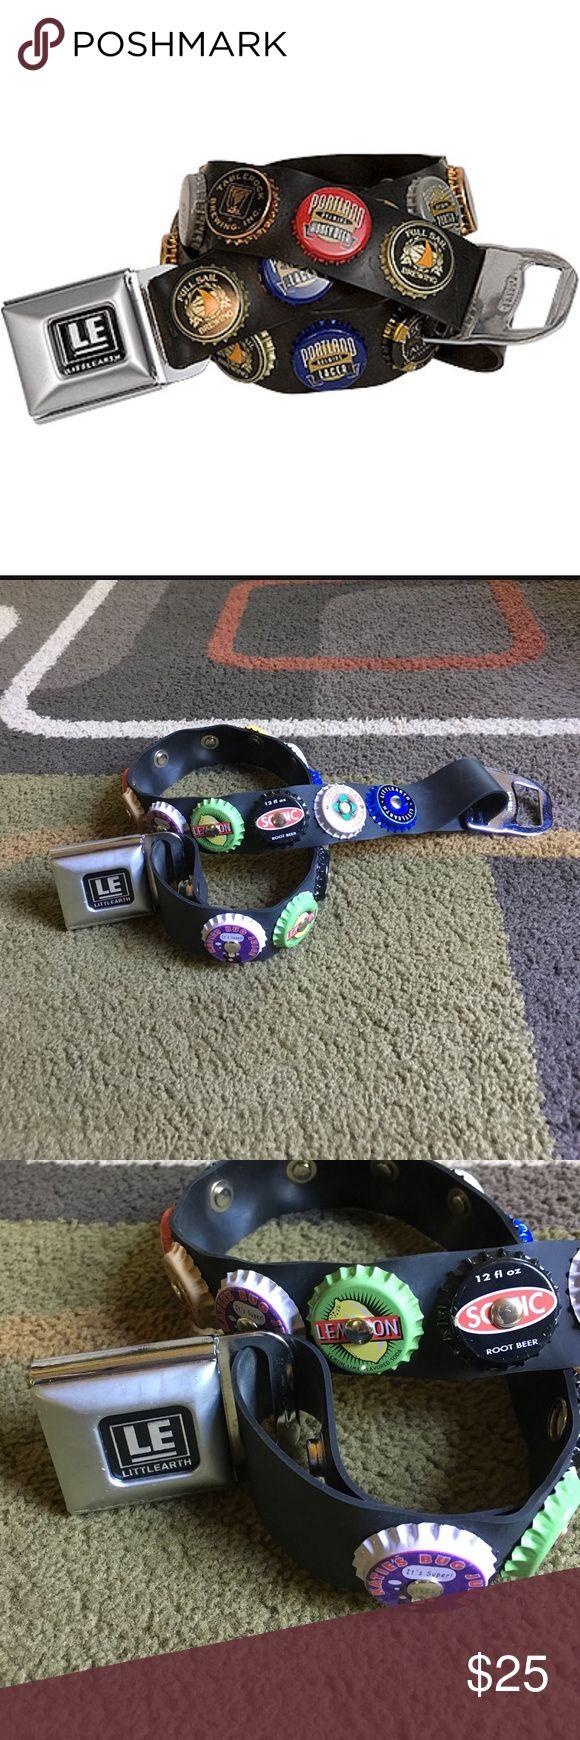 "Littlearth belt😊 Super cute bottlecap style belt with seatbelt style buckle😊 Silver hardware😊 belt strap without buckle measures approx 26.5"" 😊 belt is size Small Littlearth Accessories Belts"